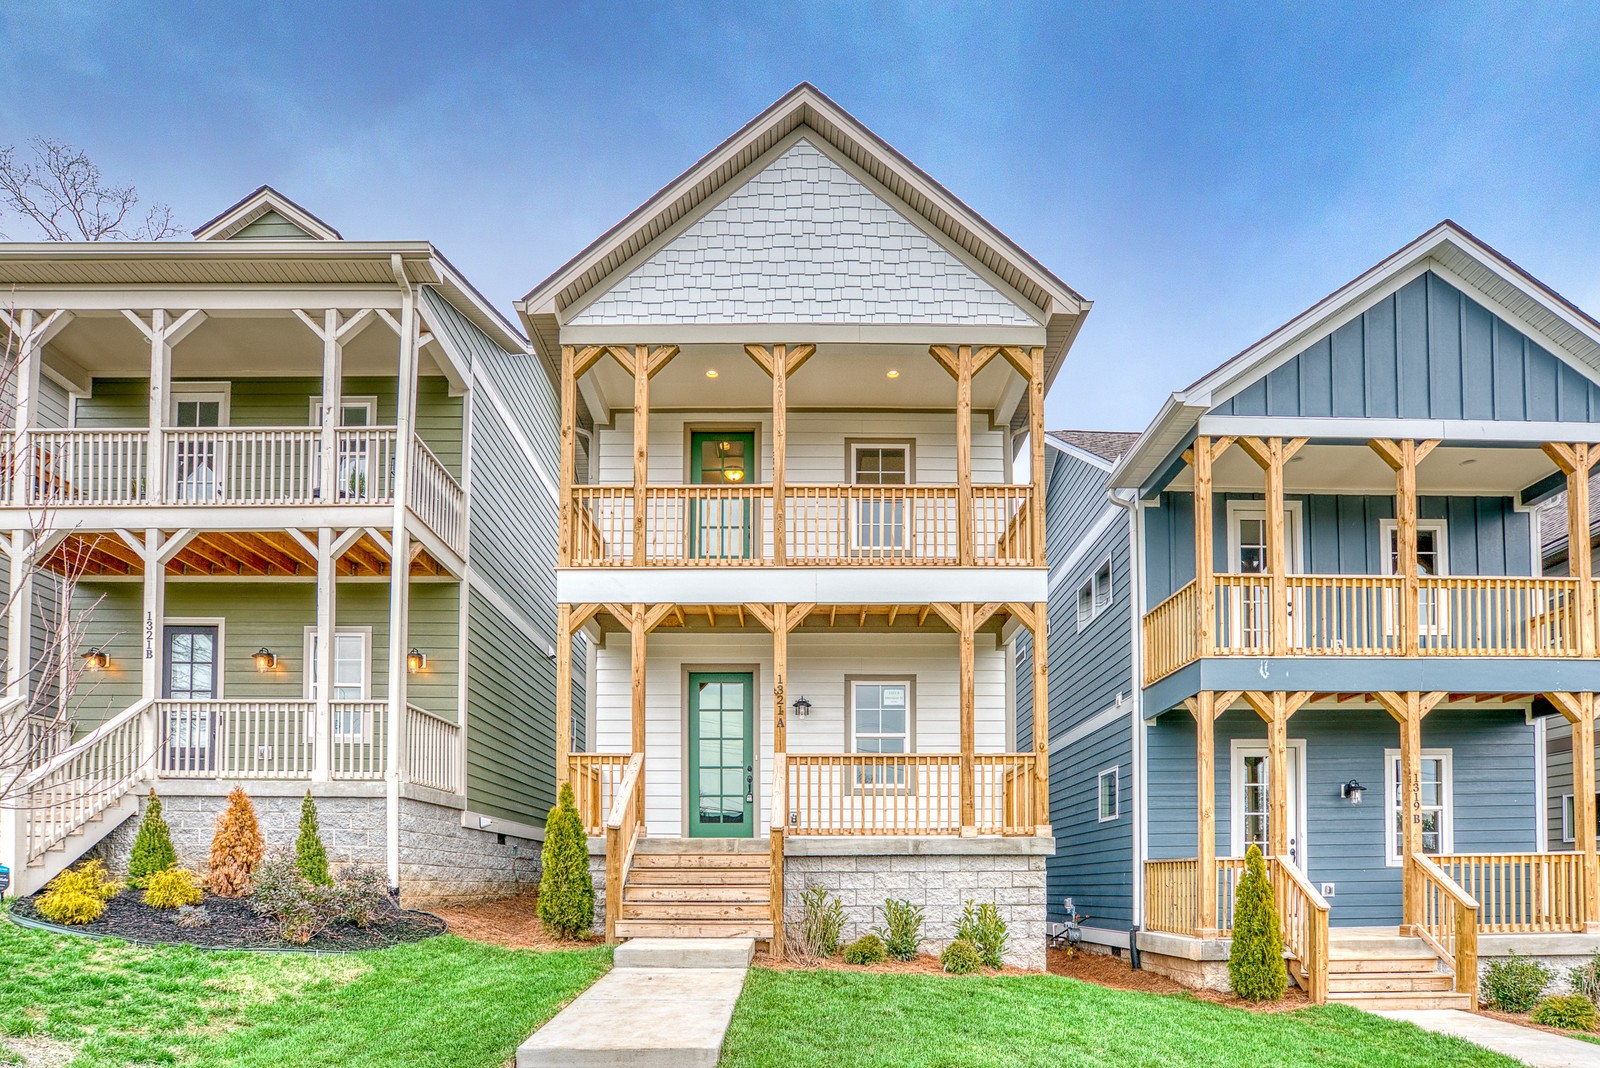 1321 Meridian St, Nashville, TN 37207 - Nashville, TN real estate listing